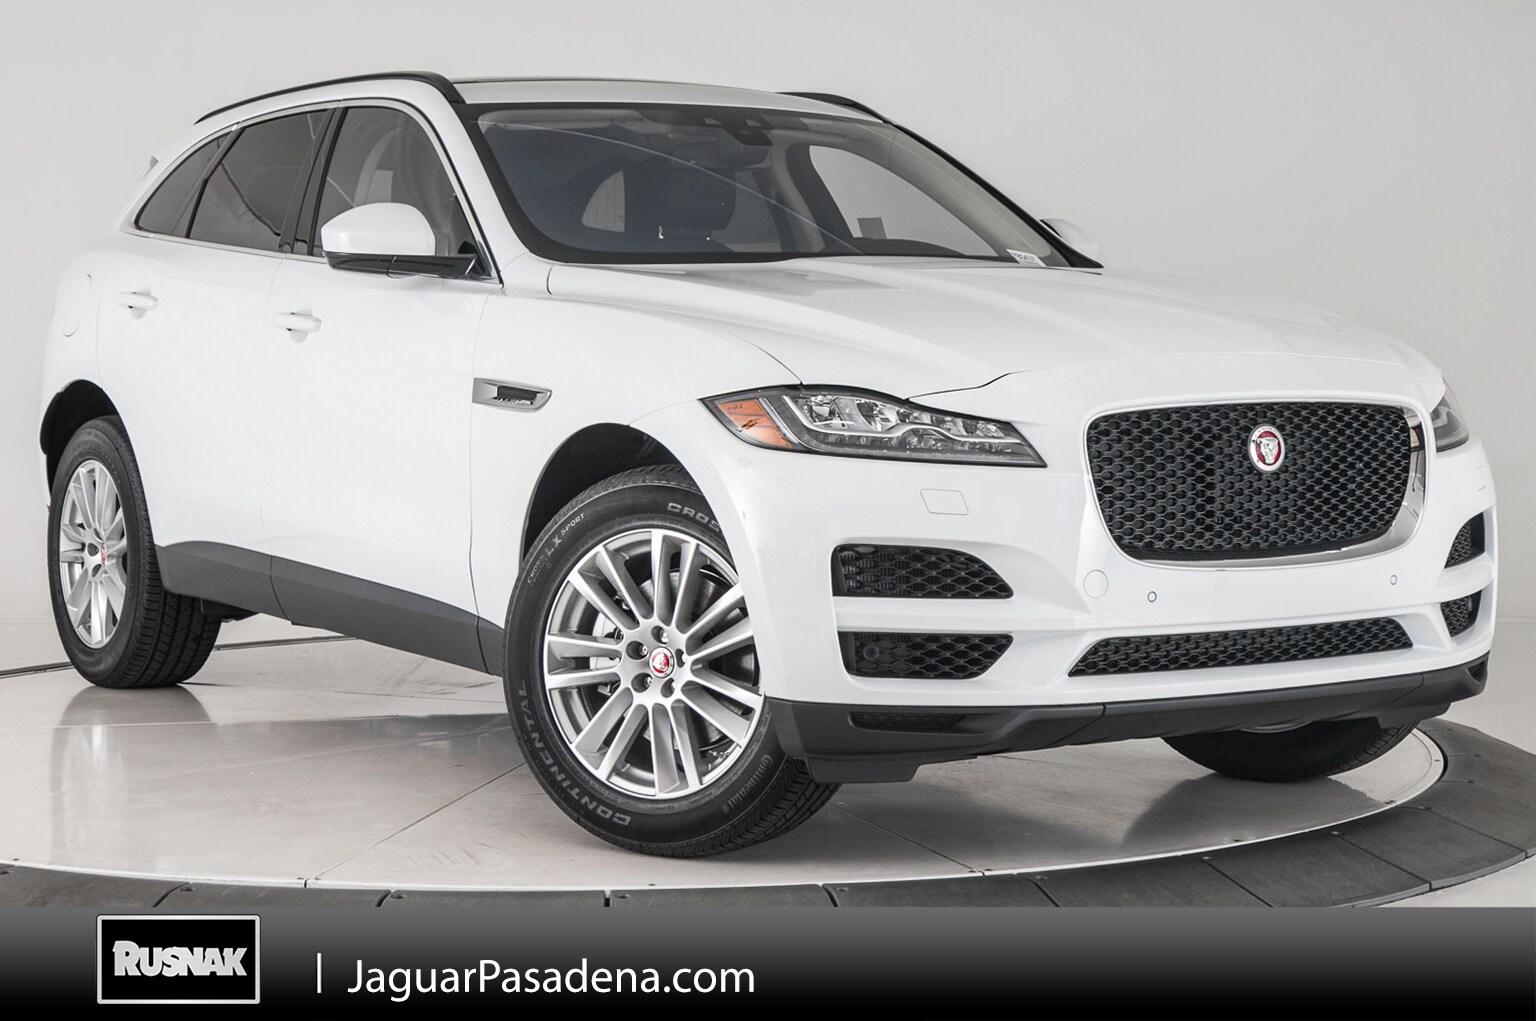 New 2018 Jaguar F-PACE Prestige SUV For Sale Los Angeles California